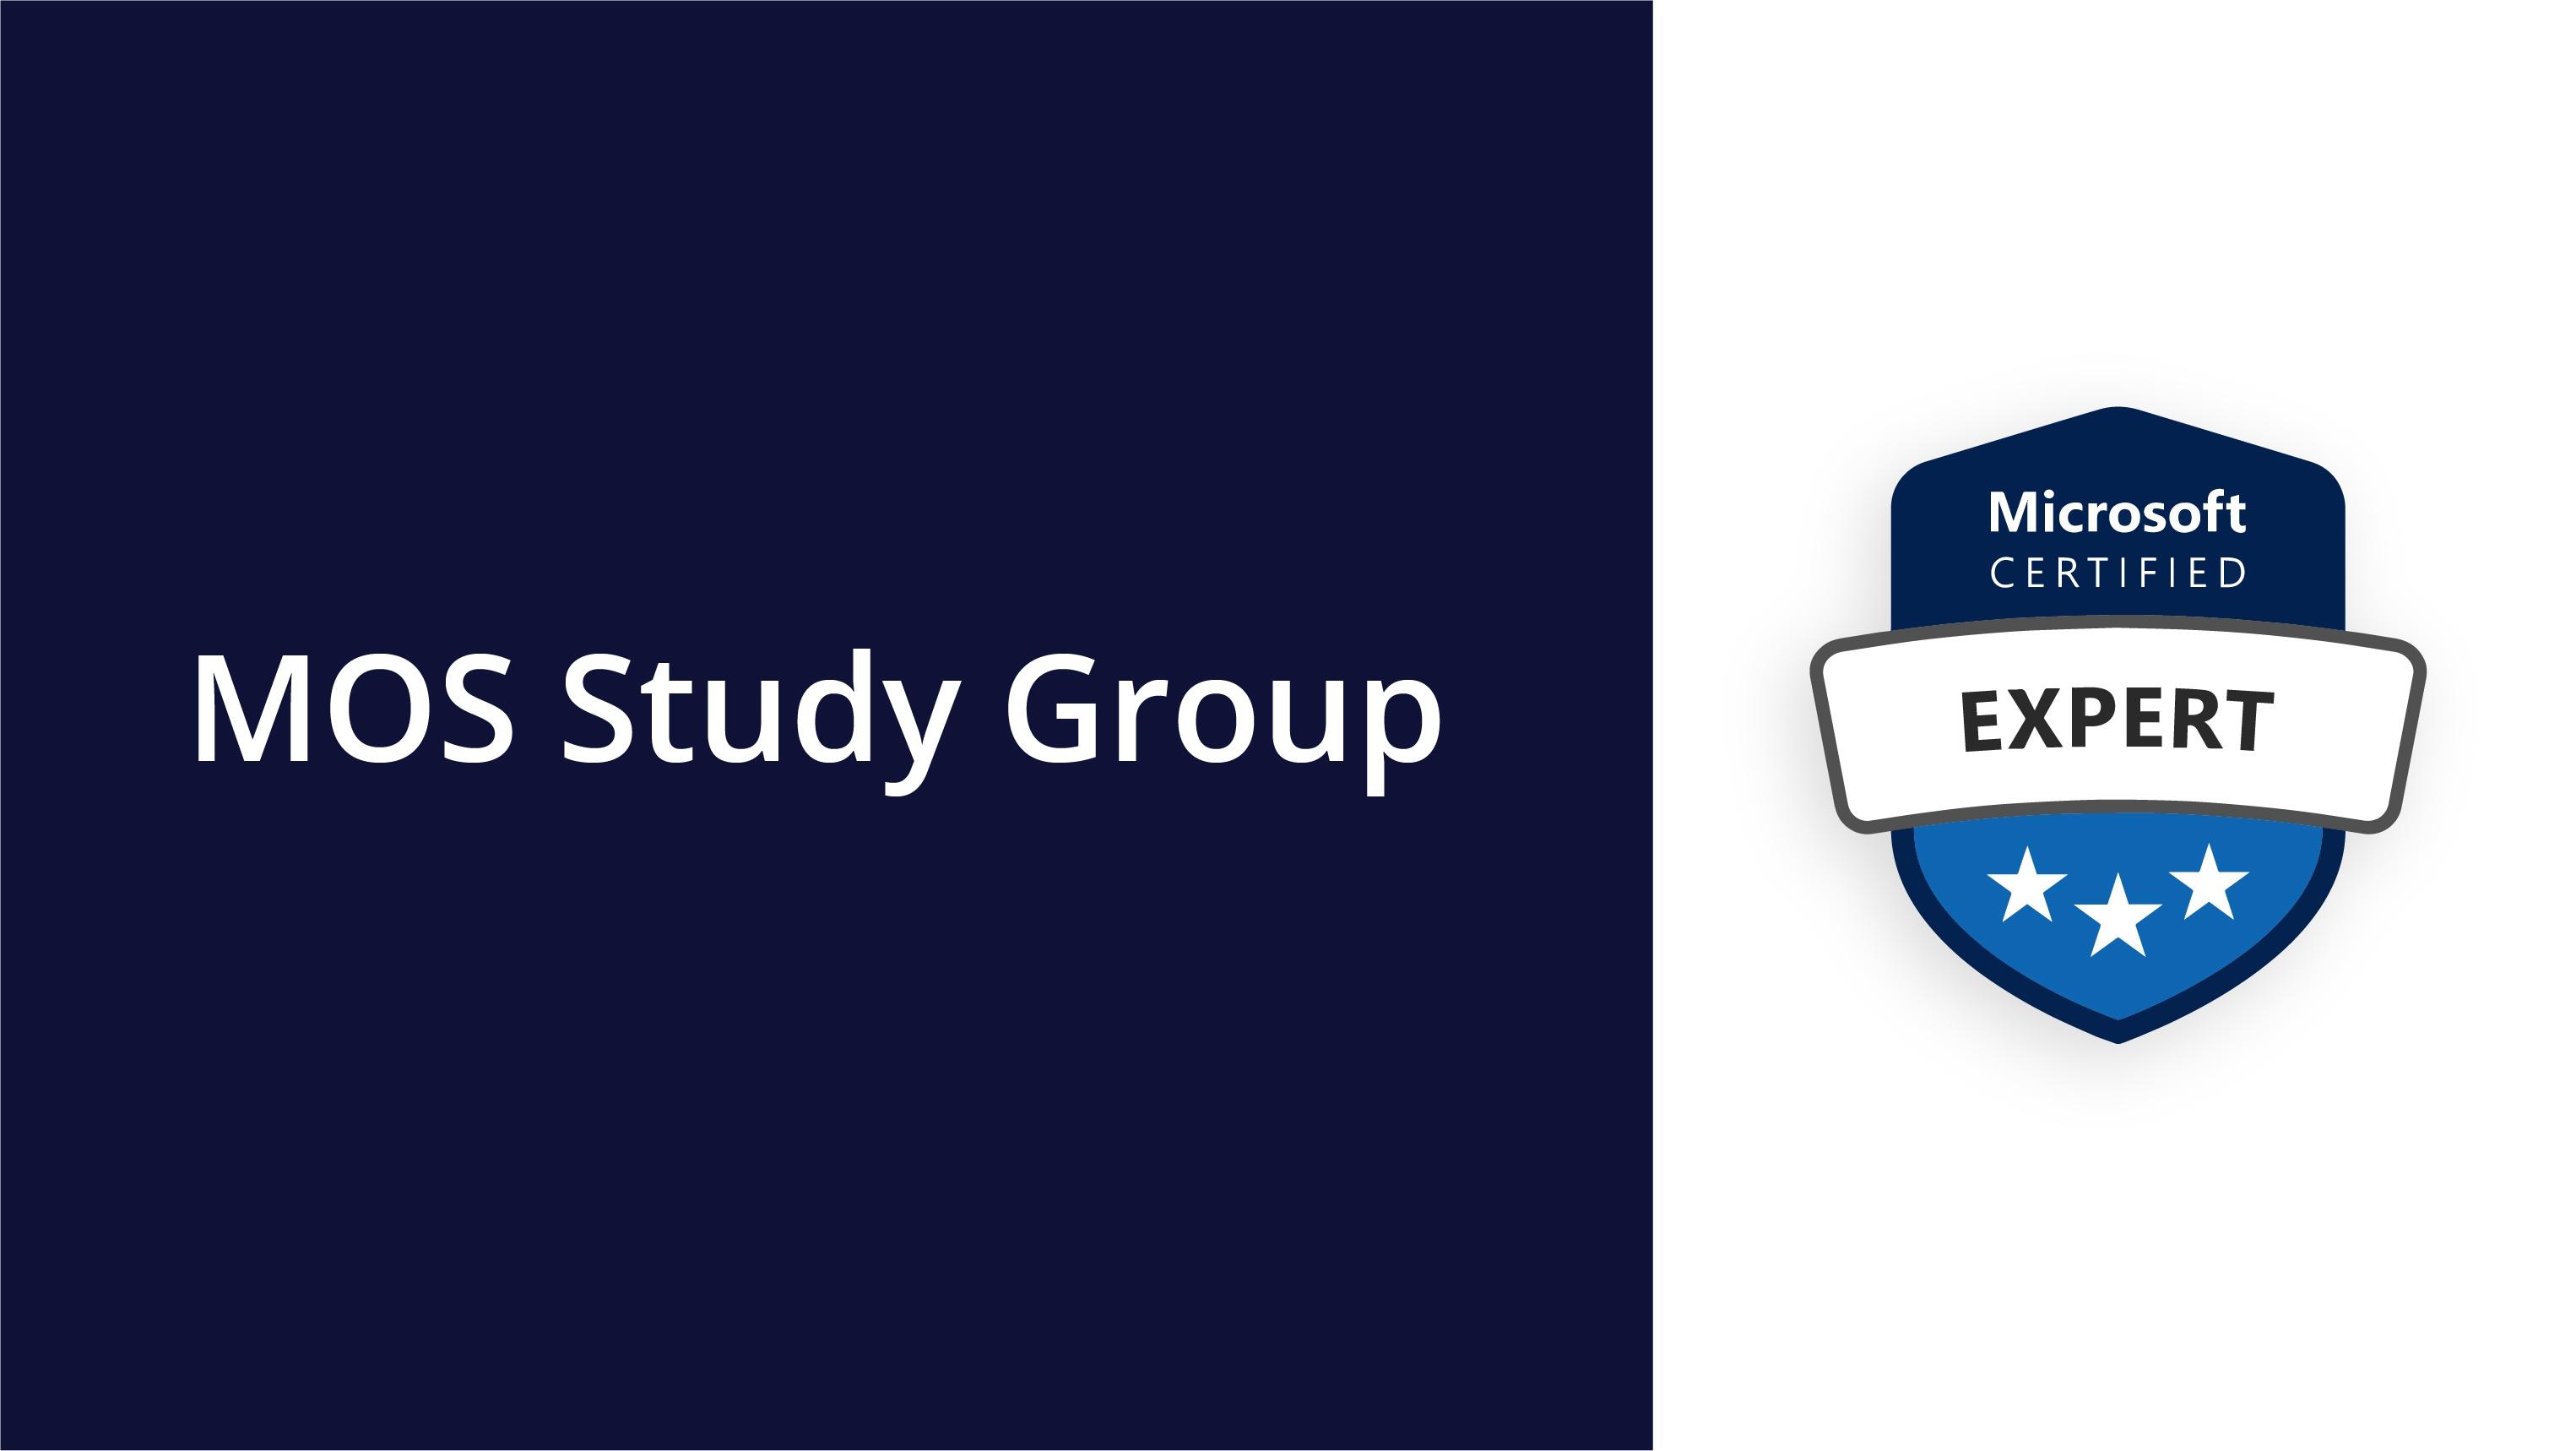 MOS Study Group